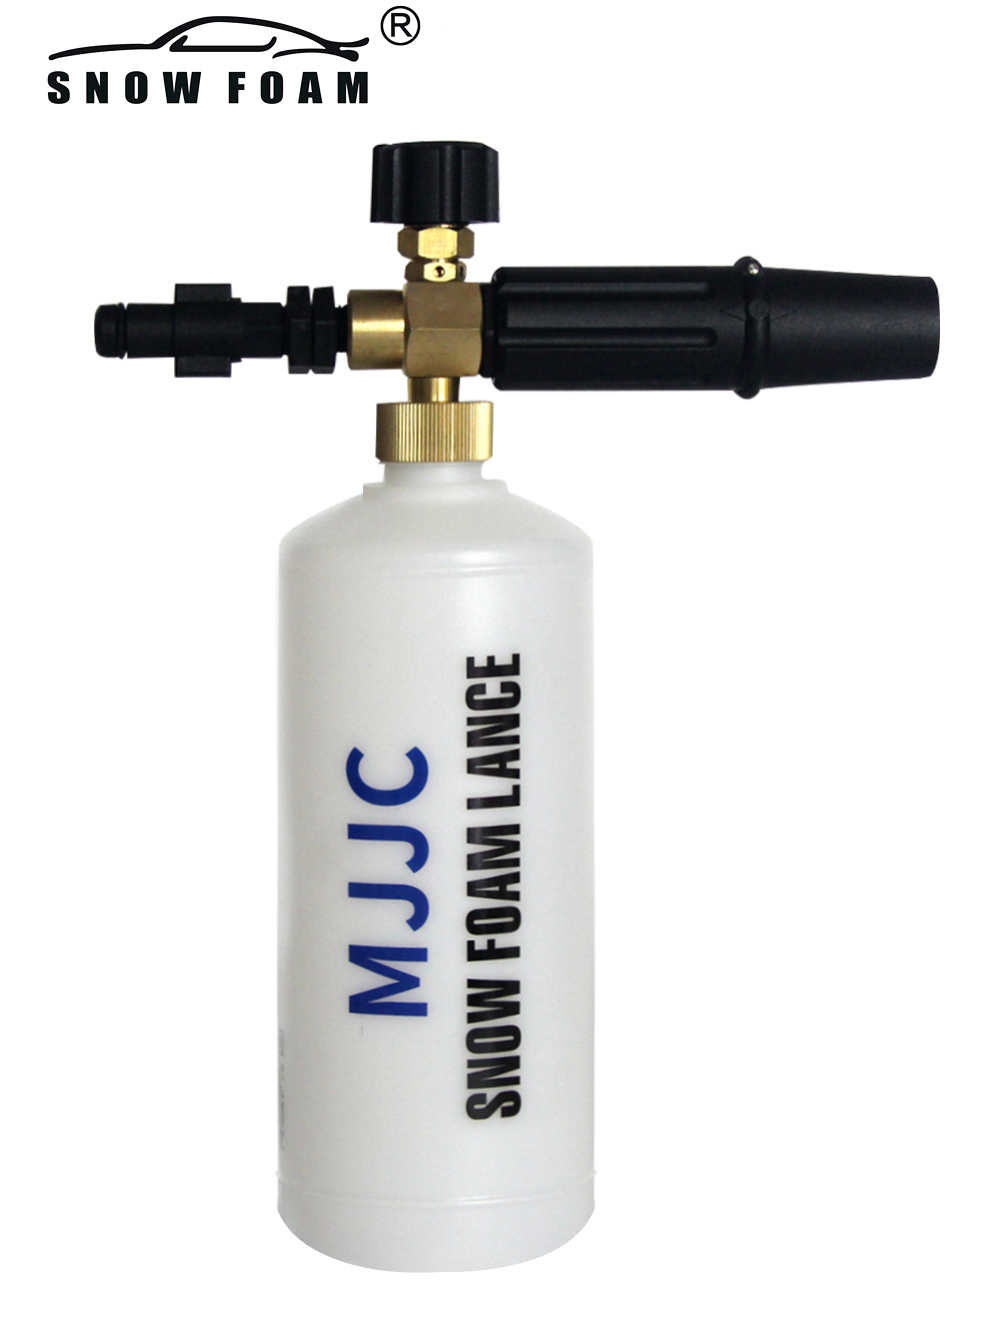 Snow Foam Nozzle for new Interskol AM100/1400C, AM120/1500C, AM140/1800C